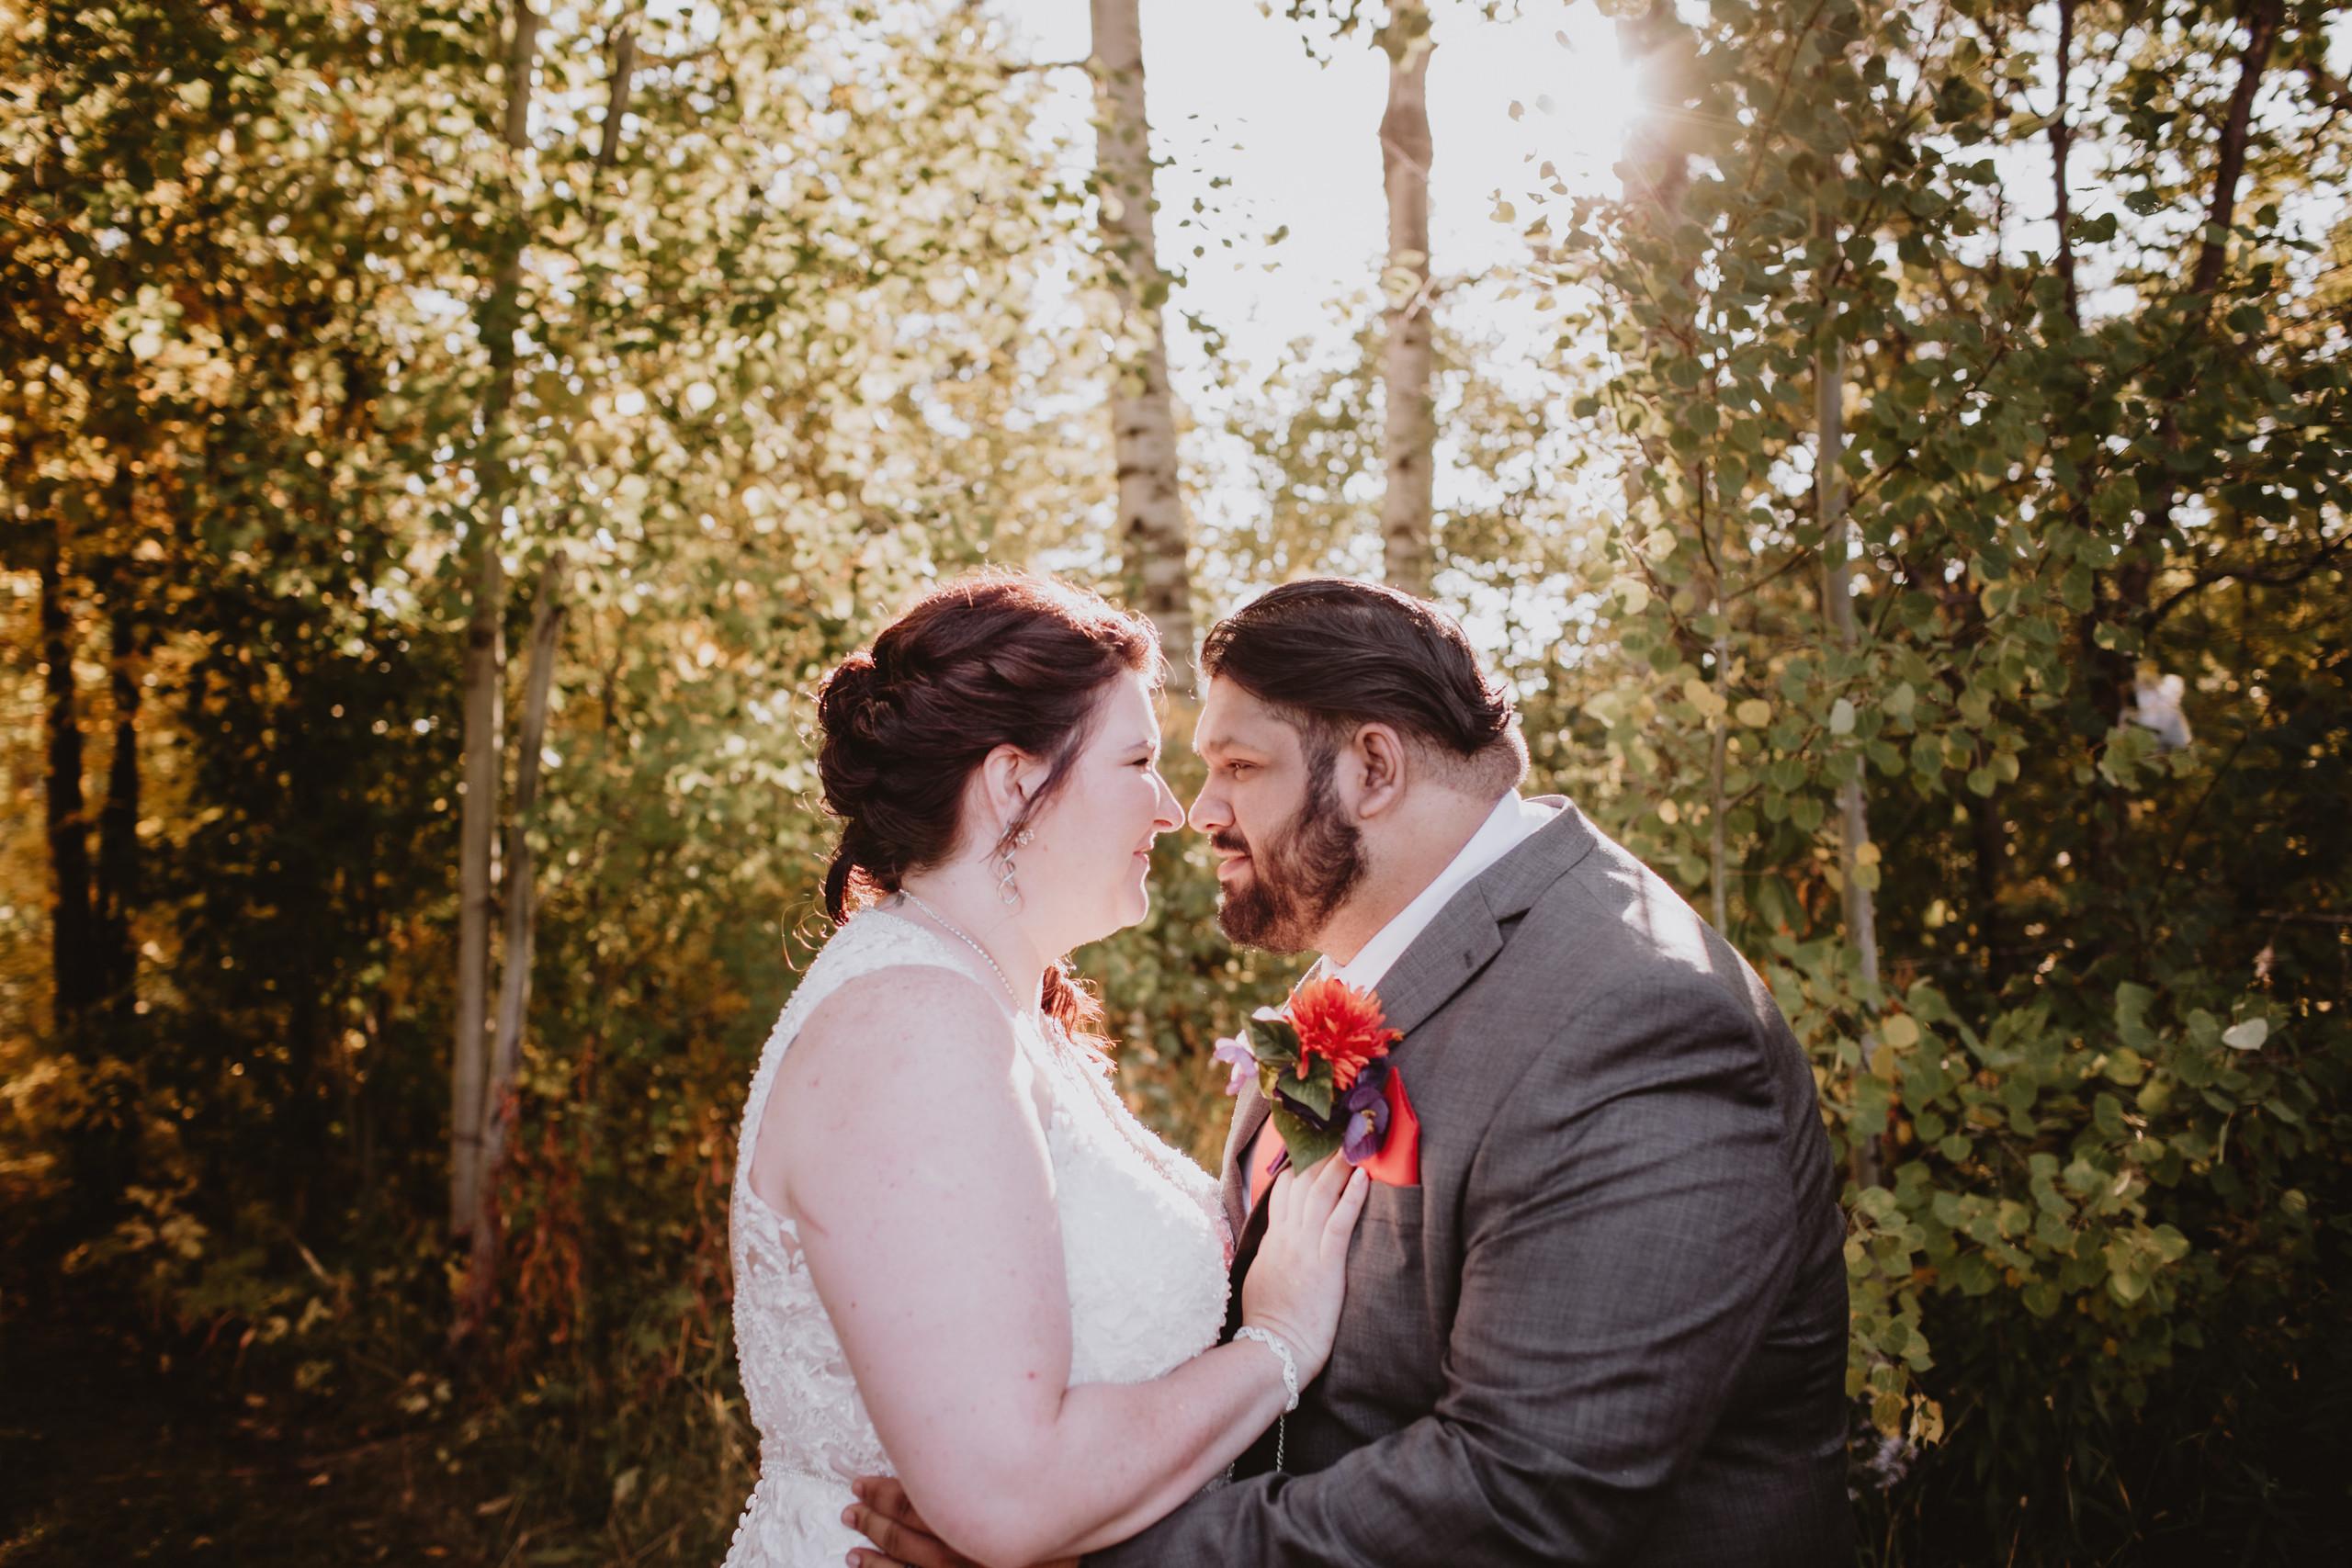 Wedding Couple Touches Noses